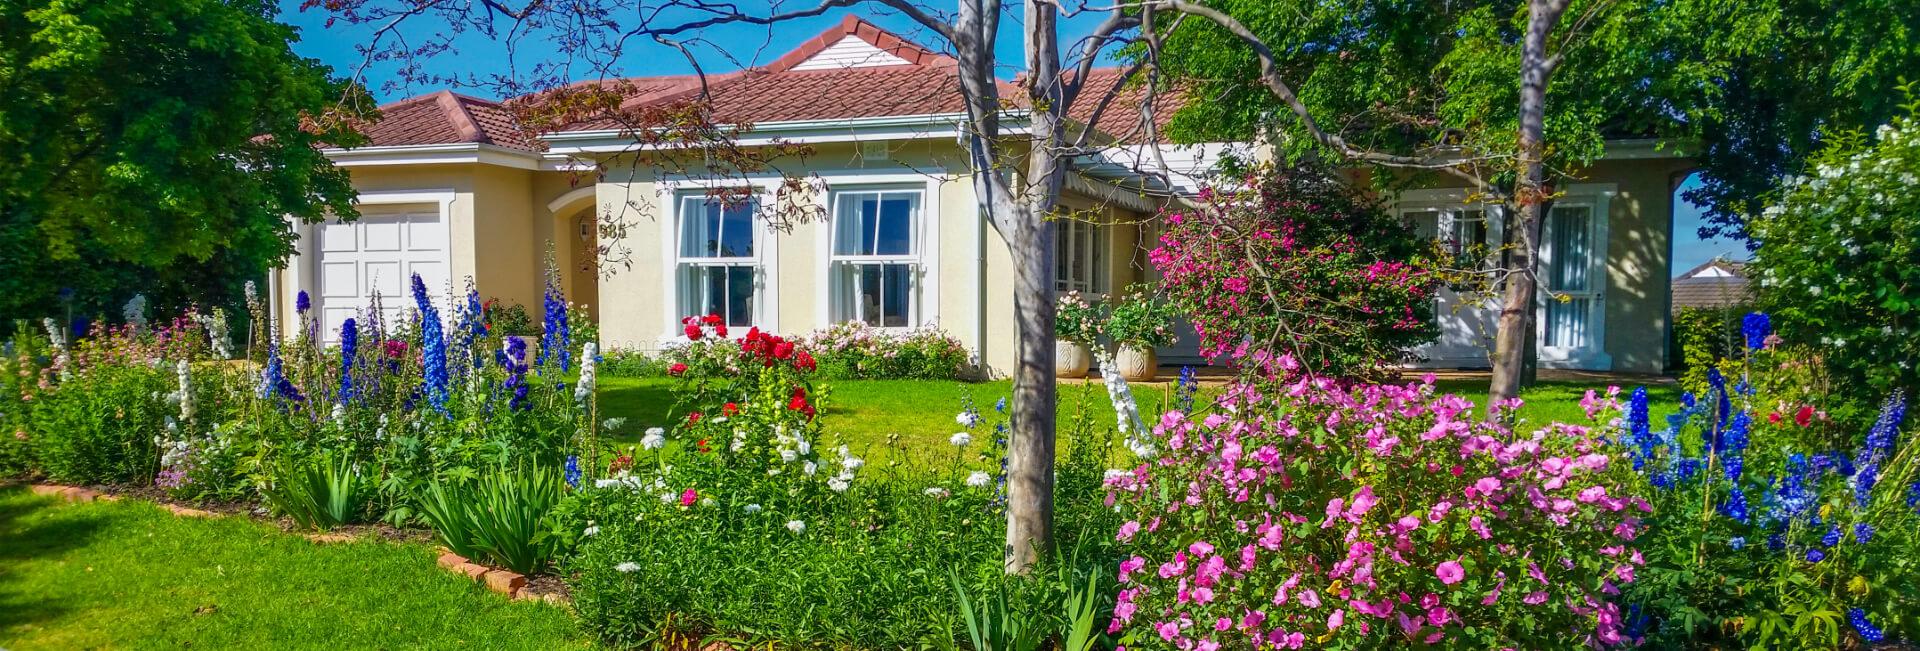 <p>Beautiful Homes Image</p> - 0